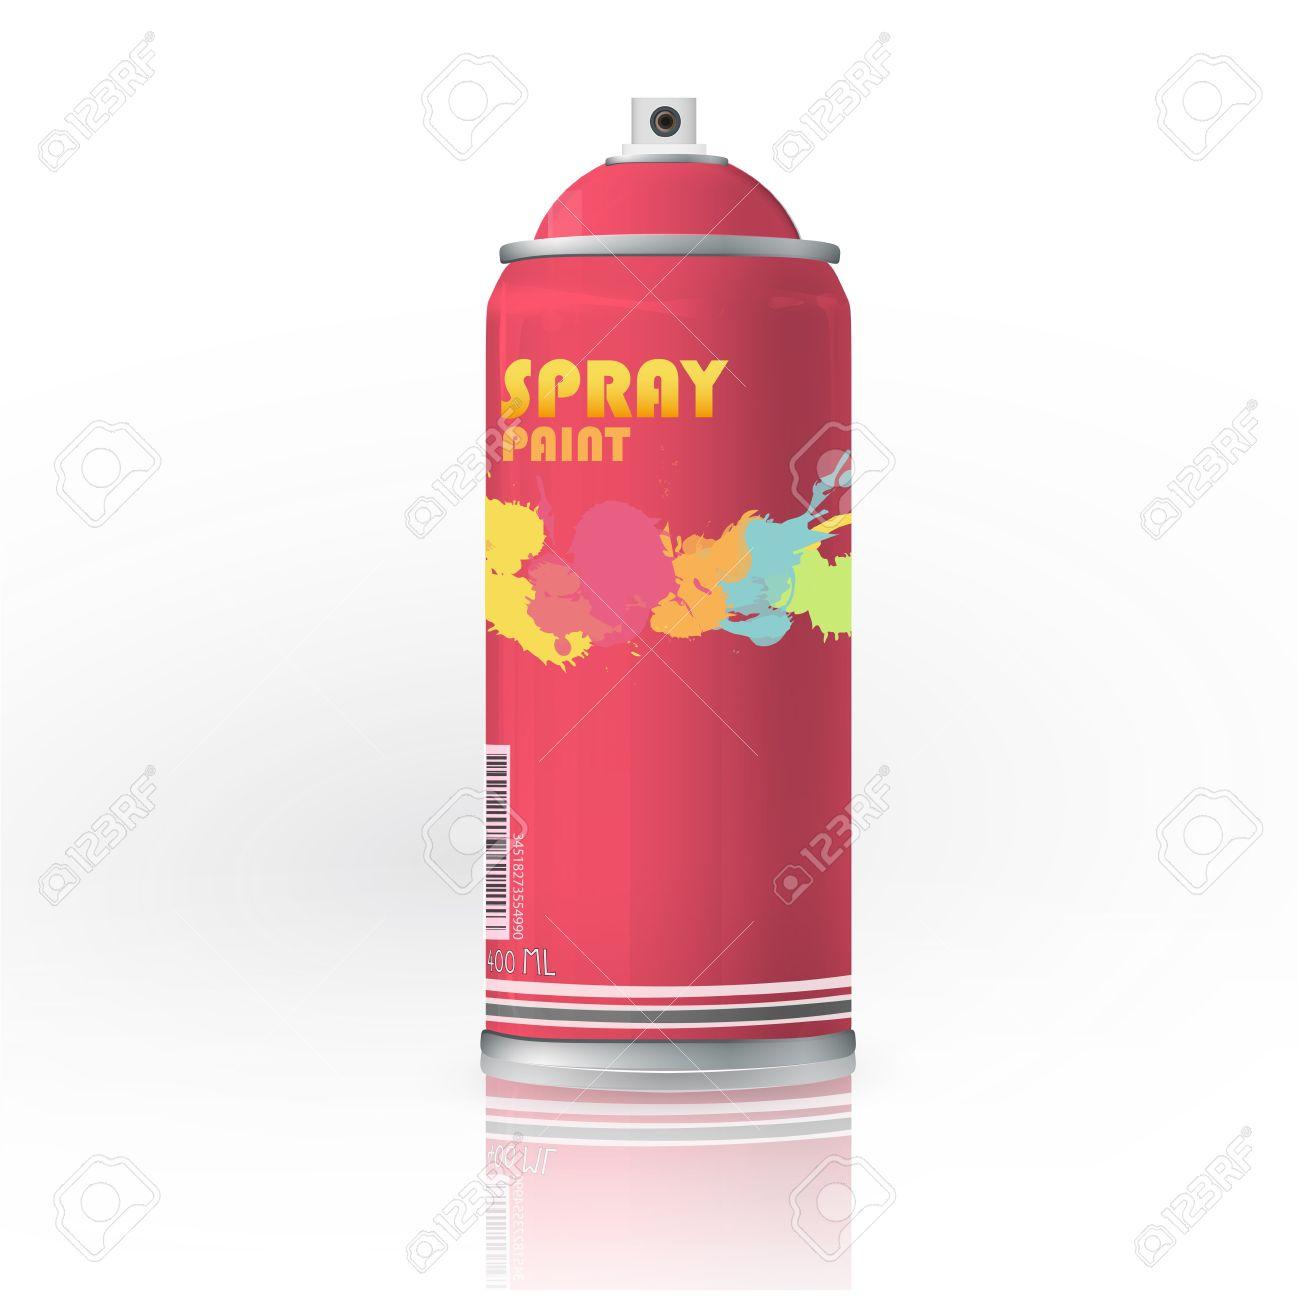 Spray color with graffiti drop  Vector design Stock Vector - 17787006